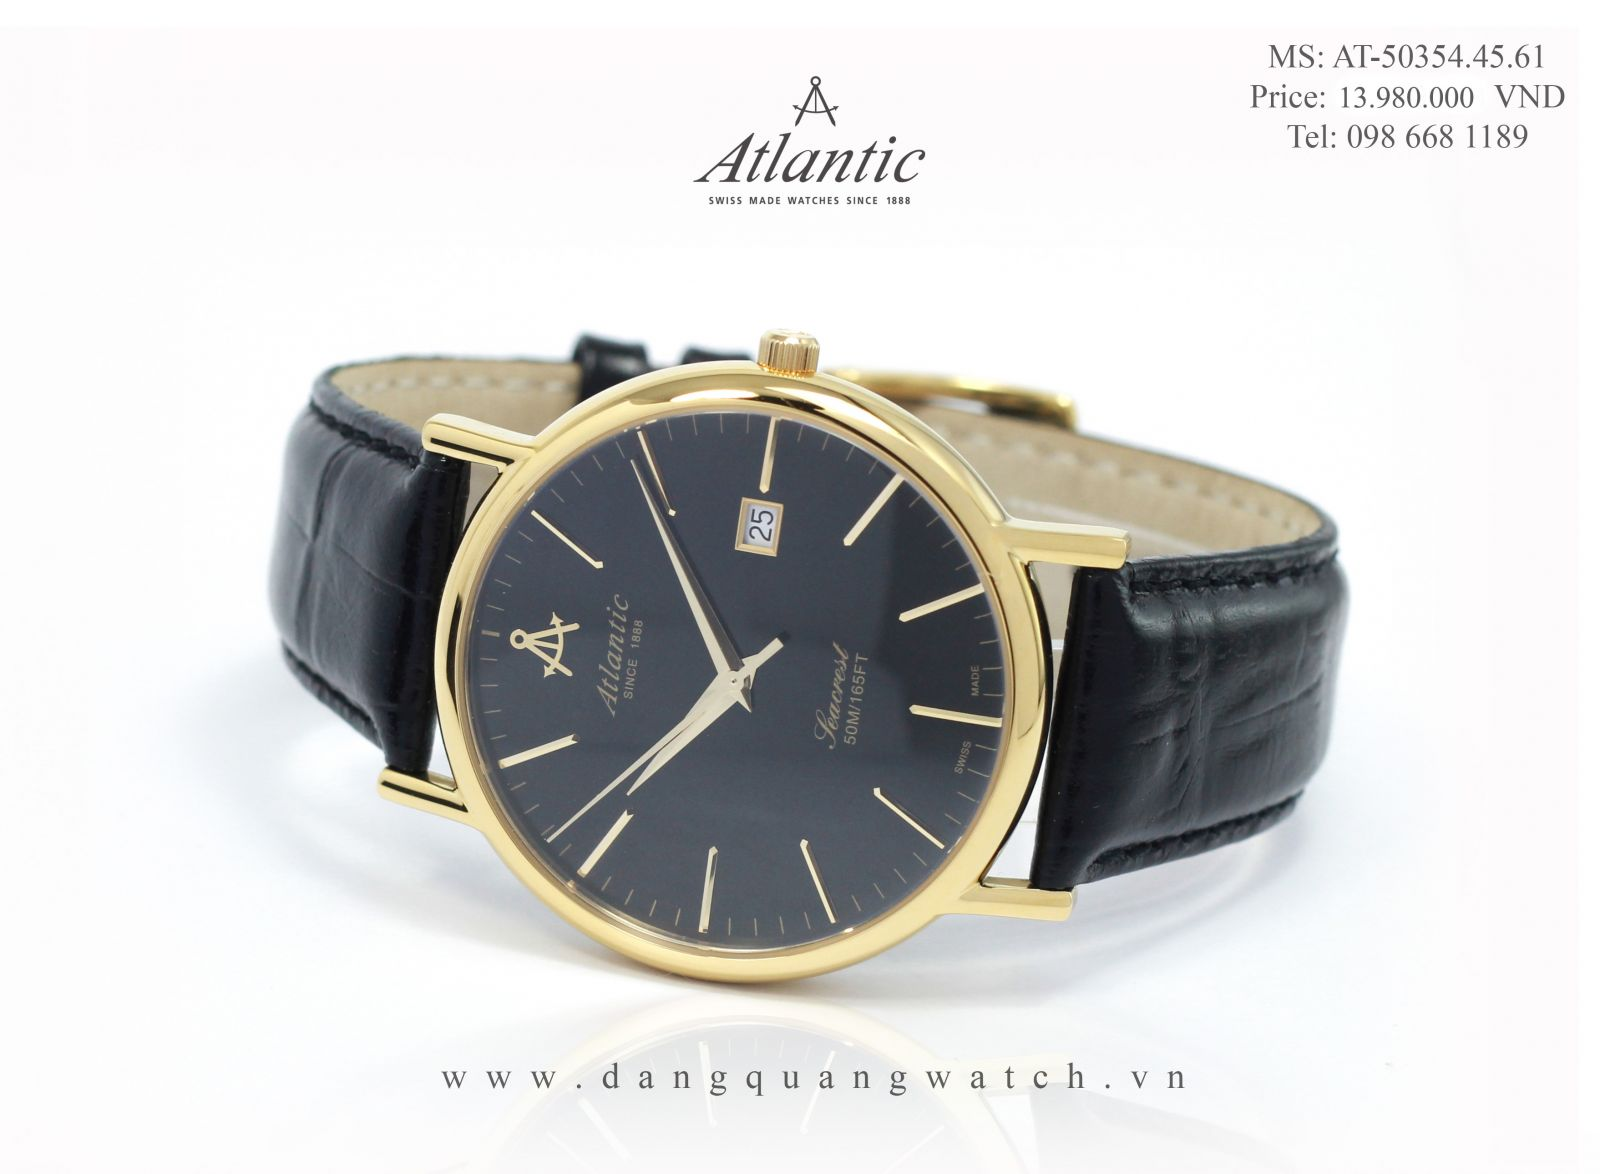 Đồng hồ nam atlantic 50354.45.61